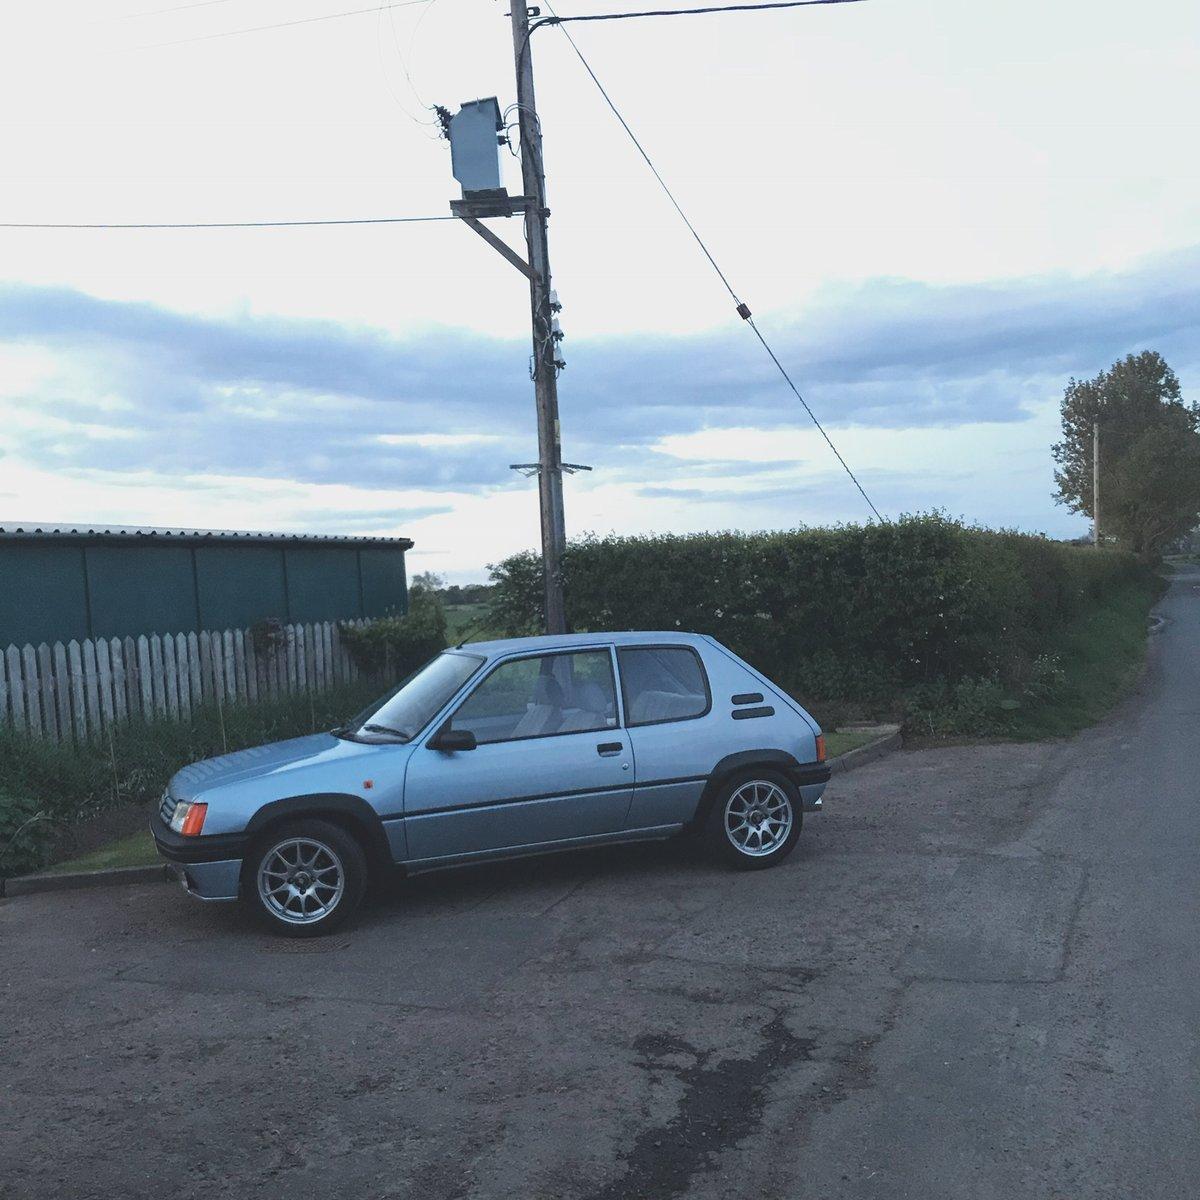 1990 Peugeot 205 XR 1.6 16v GTI/VTS For Sale (picture 3 of 6)